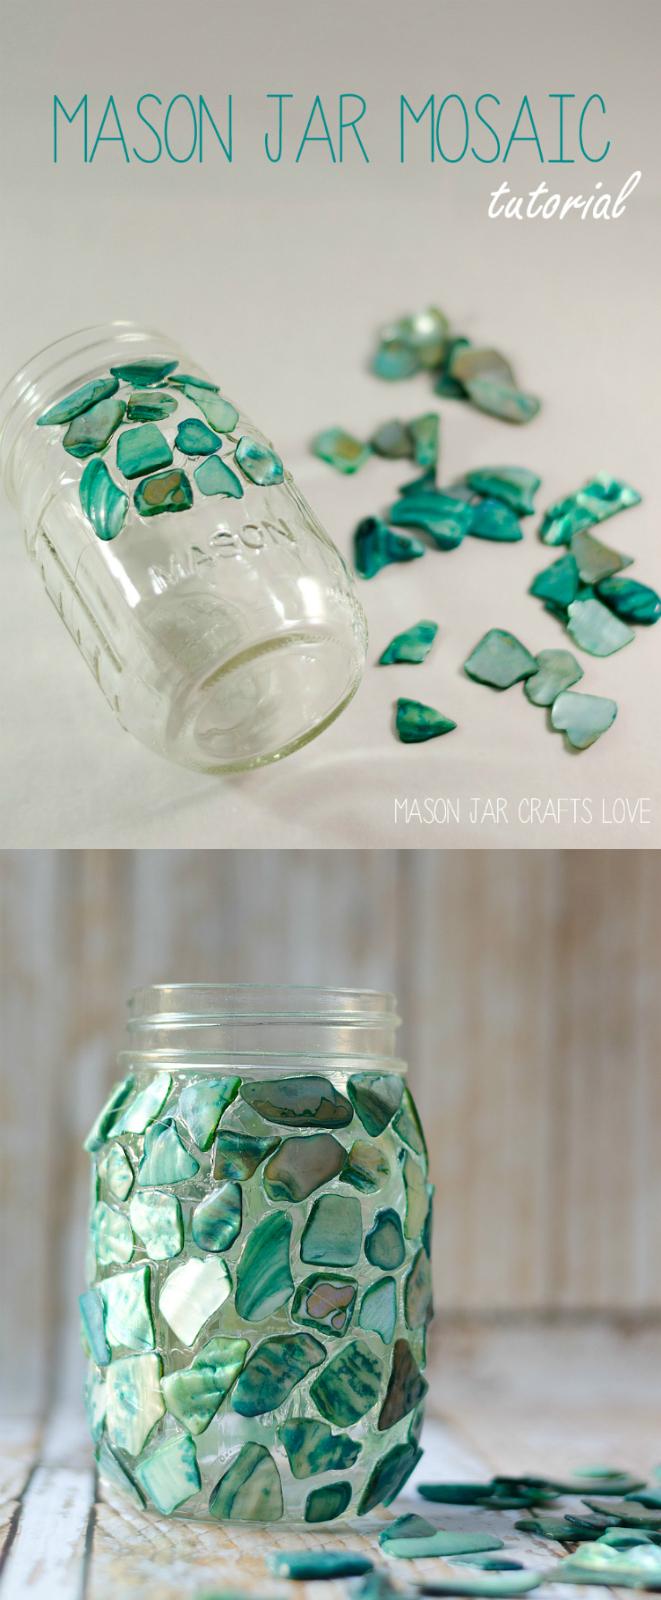 Mosaic Mason Jar - Mason Jar Crafts Love